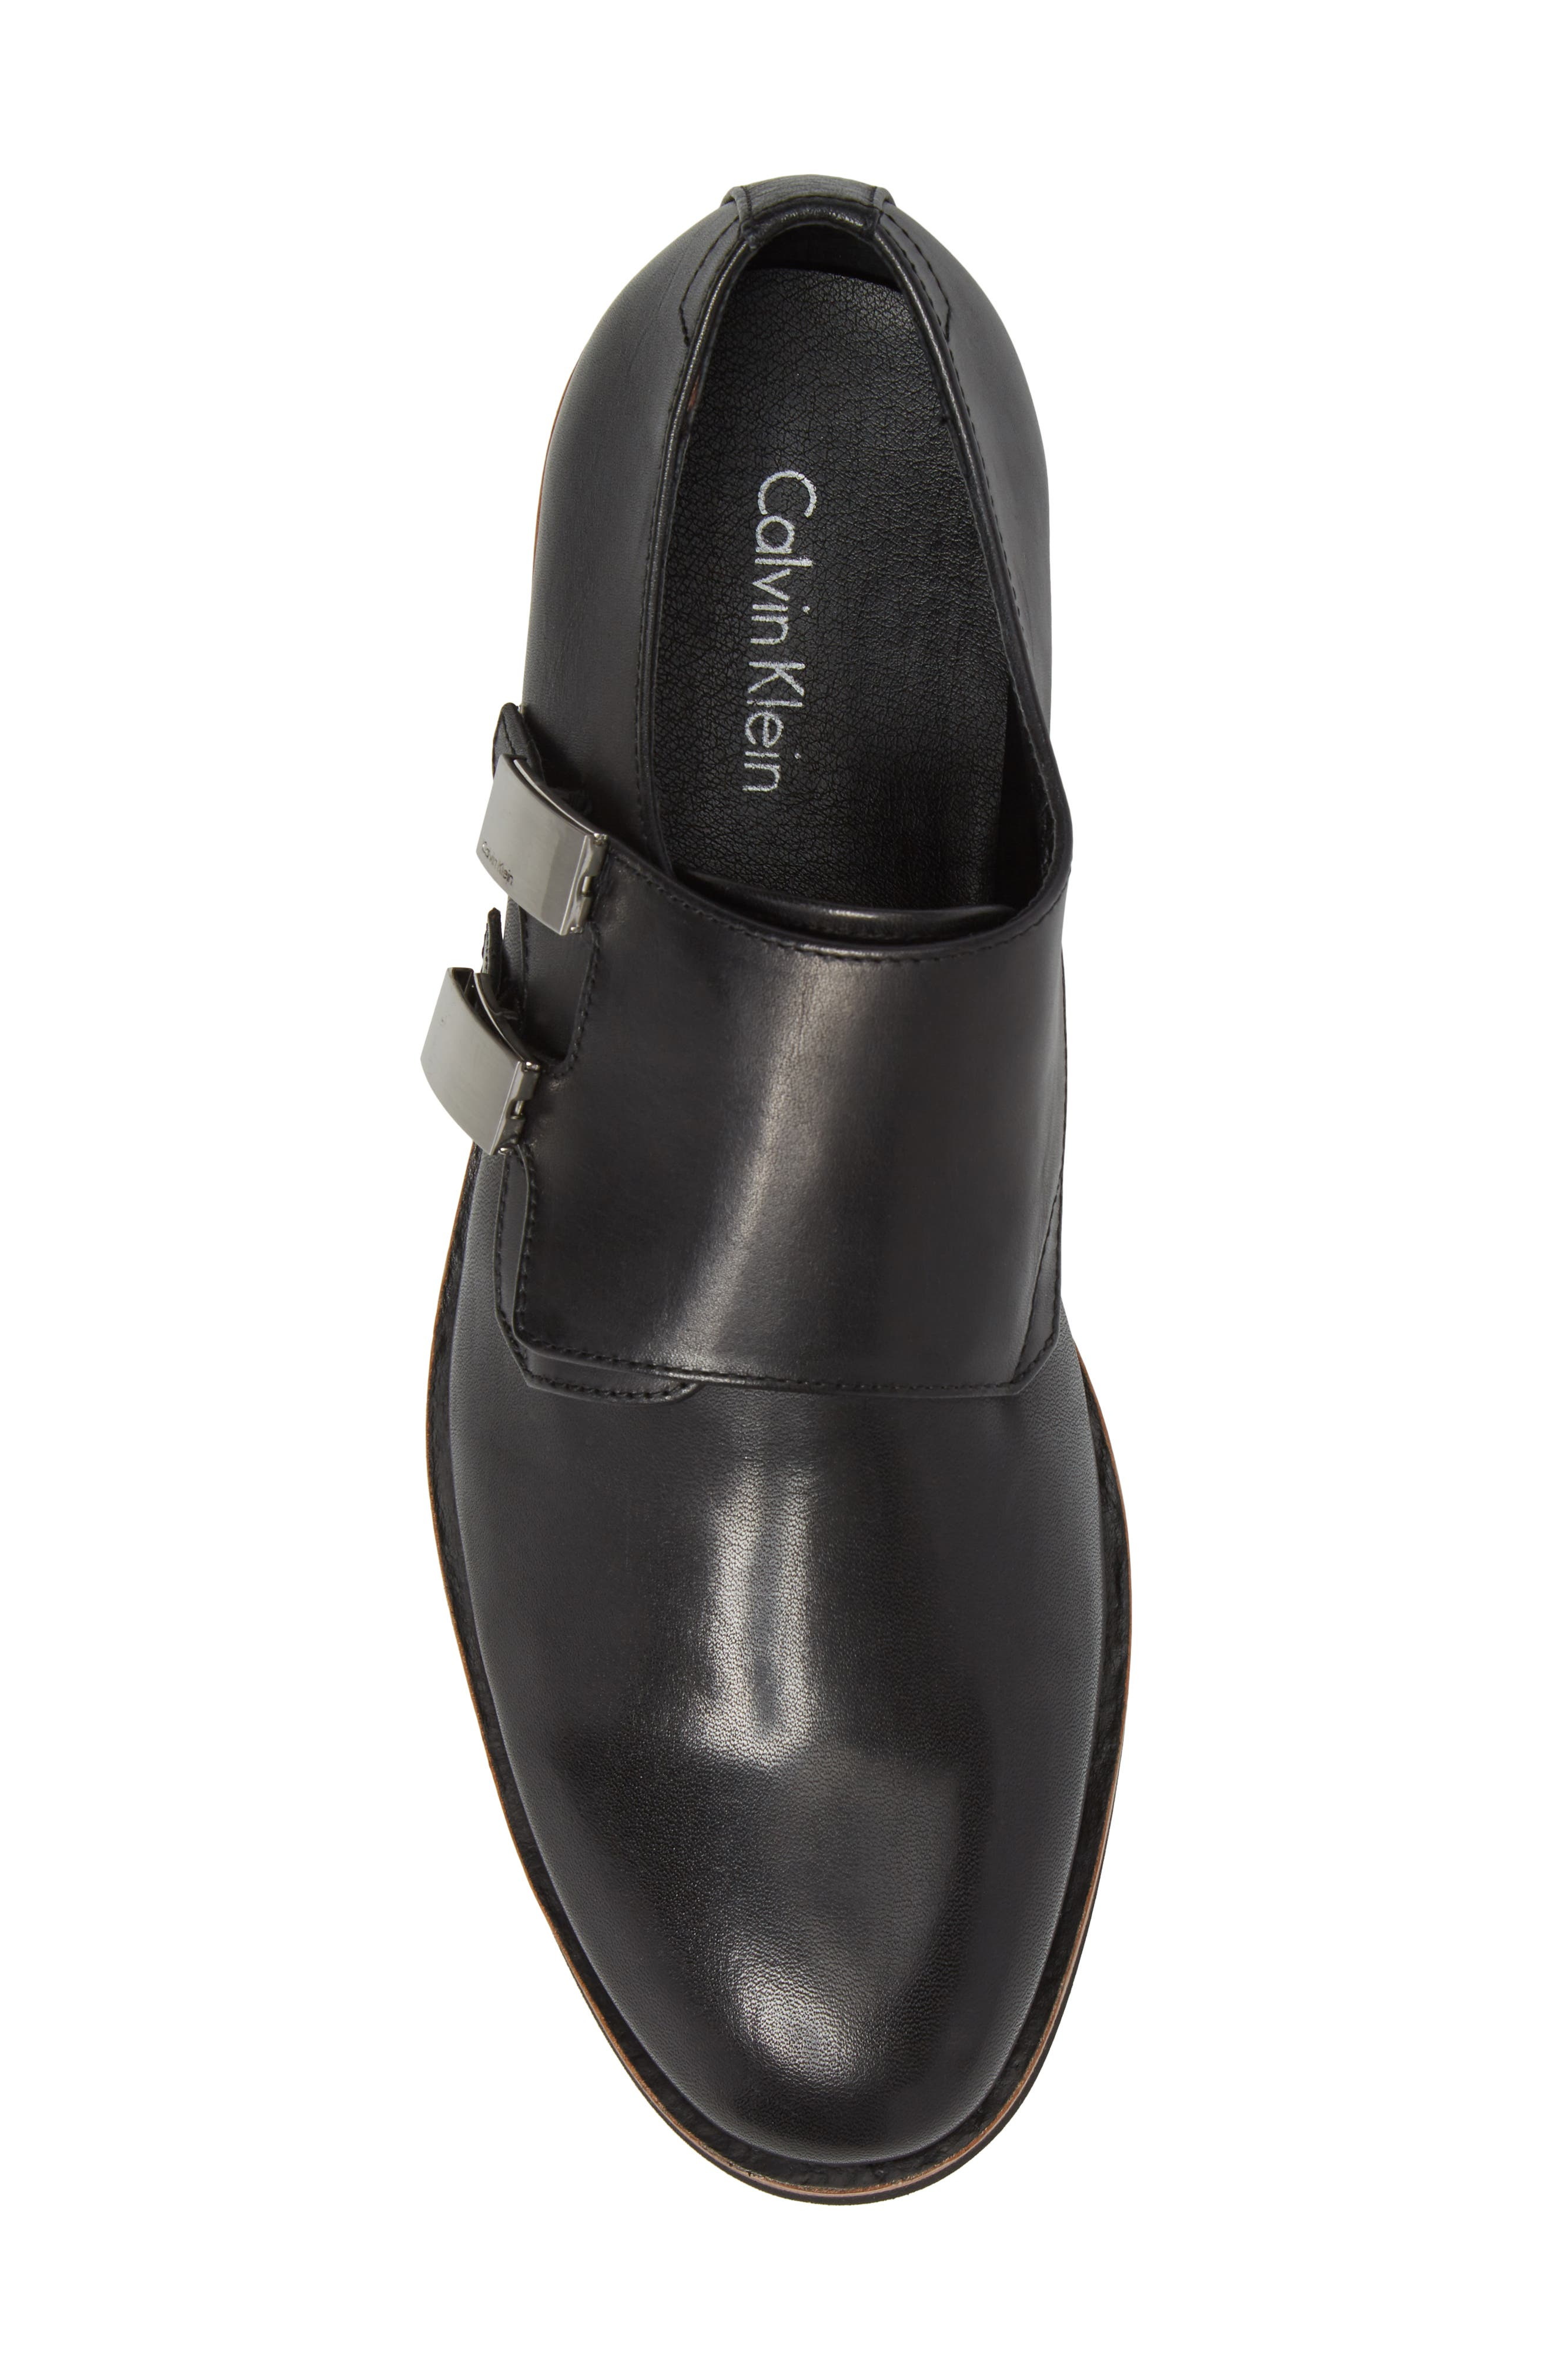 Finnegan Double Monk Strap Shoe,                             Alternate thumbnail 5, color,                             Black Leather